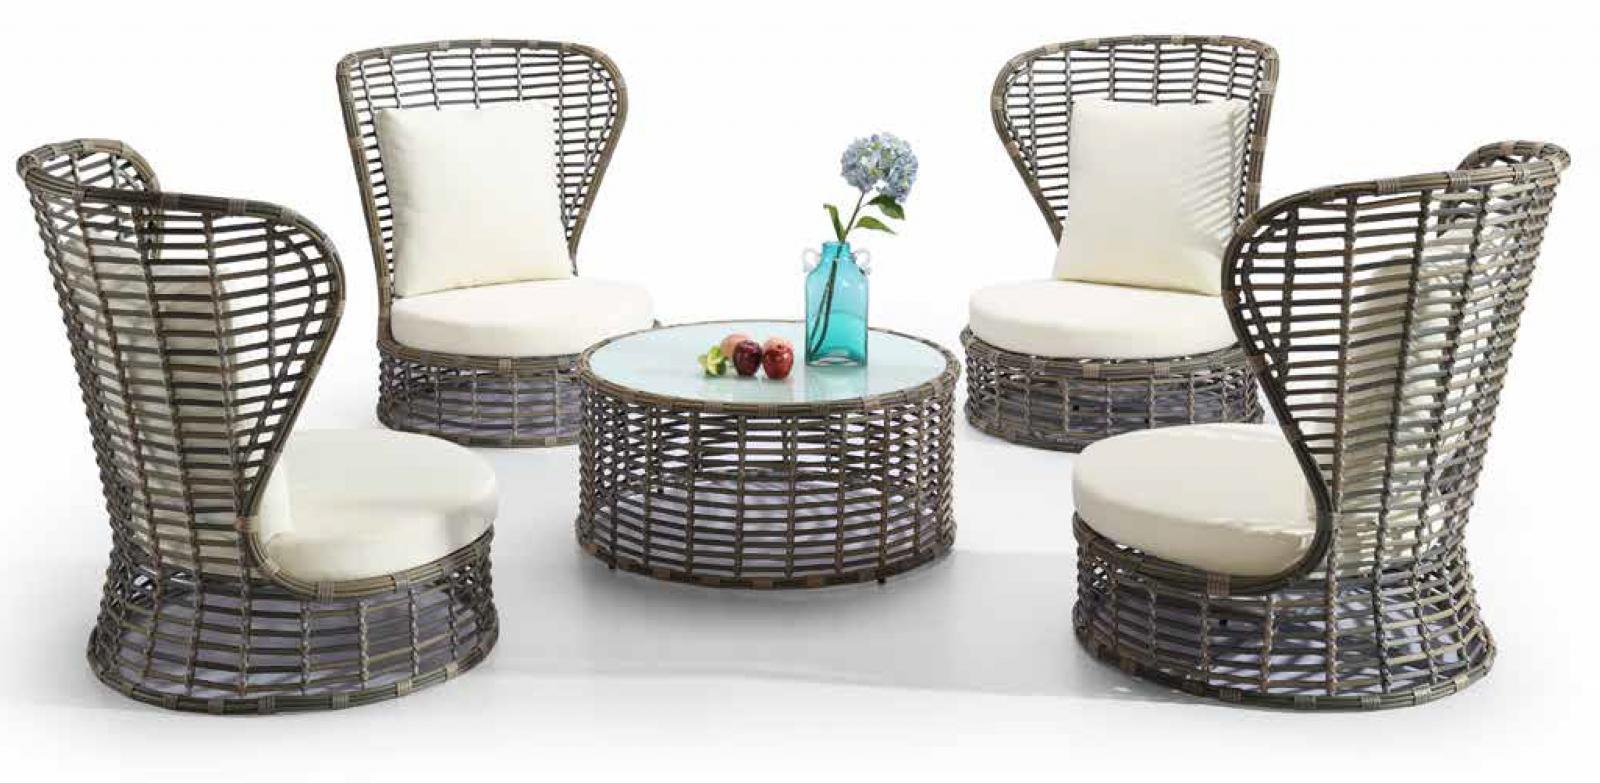 Комплект плетеной мебели Montana